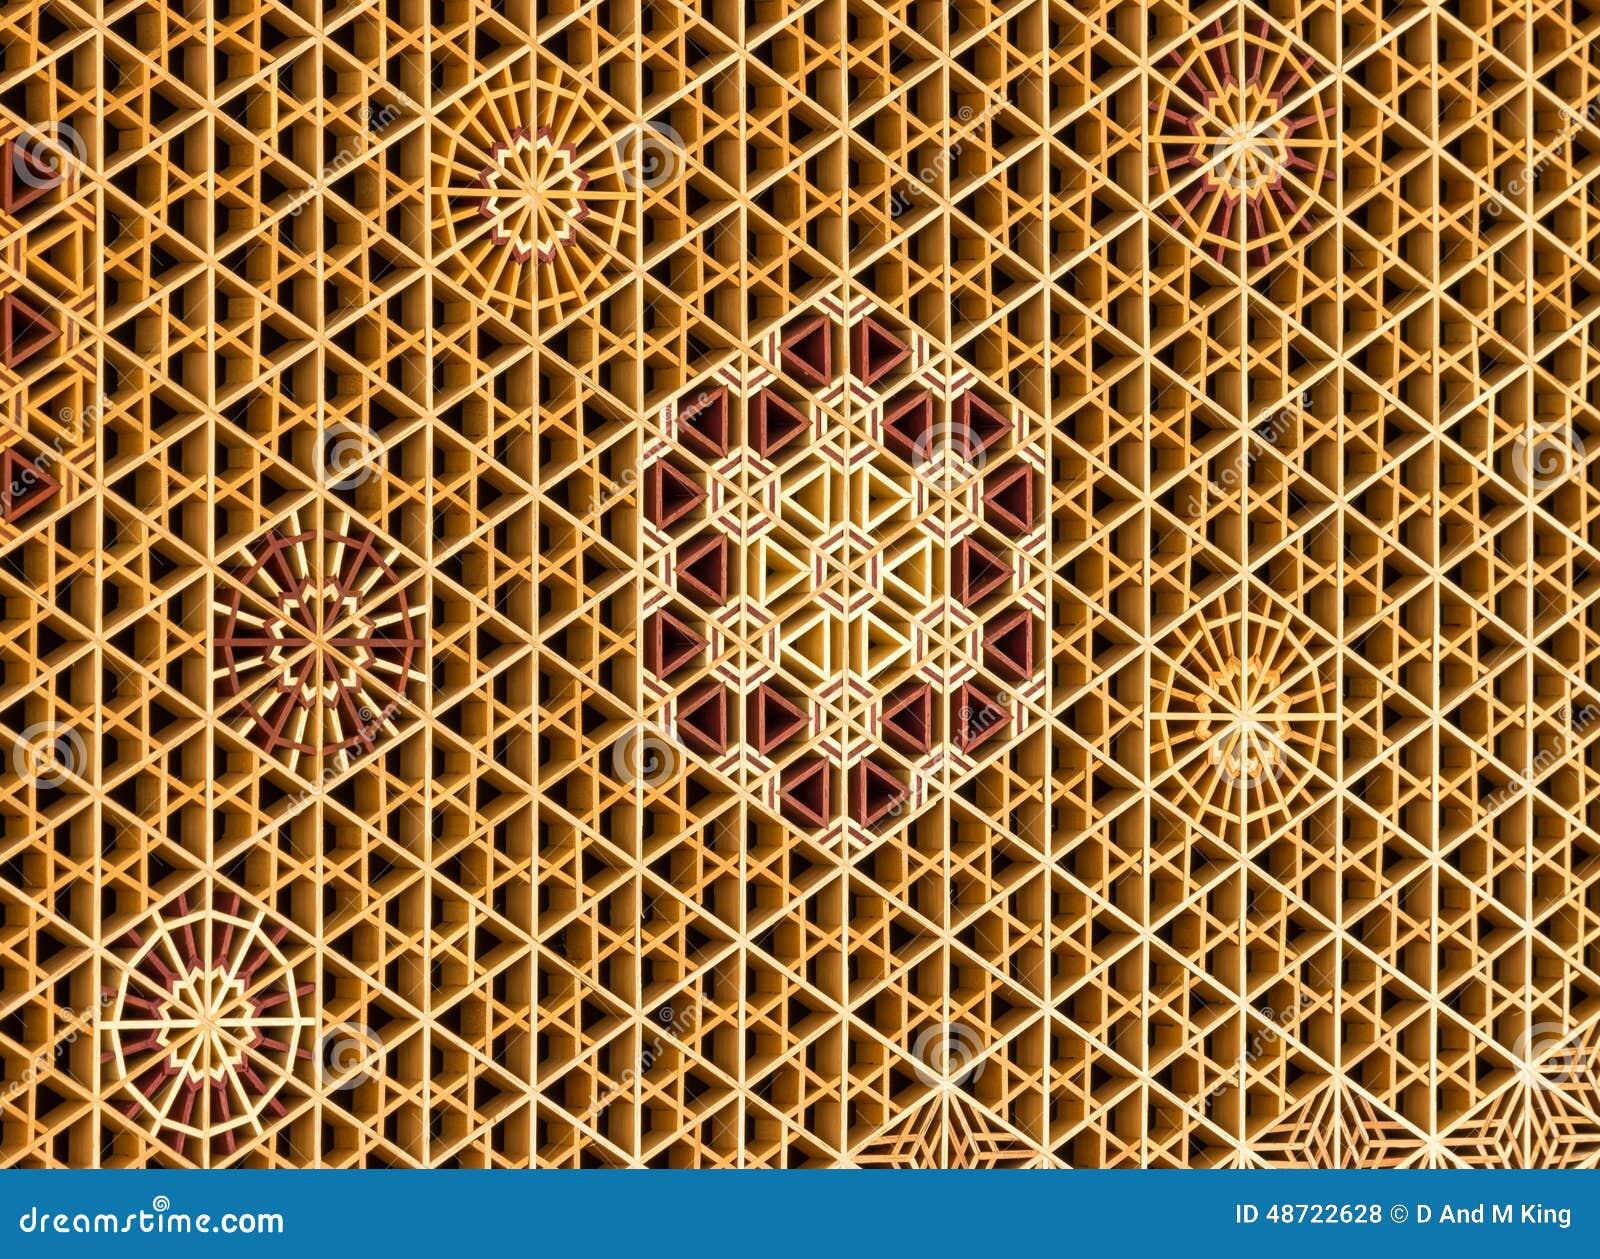 Shoji And Kumiko Pattern Kaza Guruma Stock Photo Image